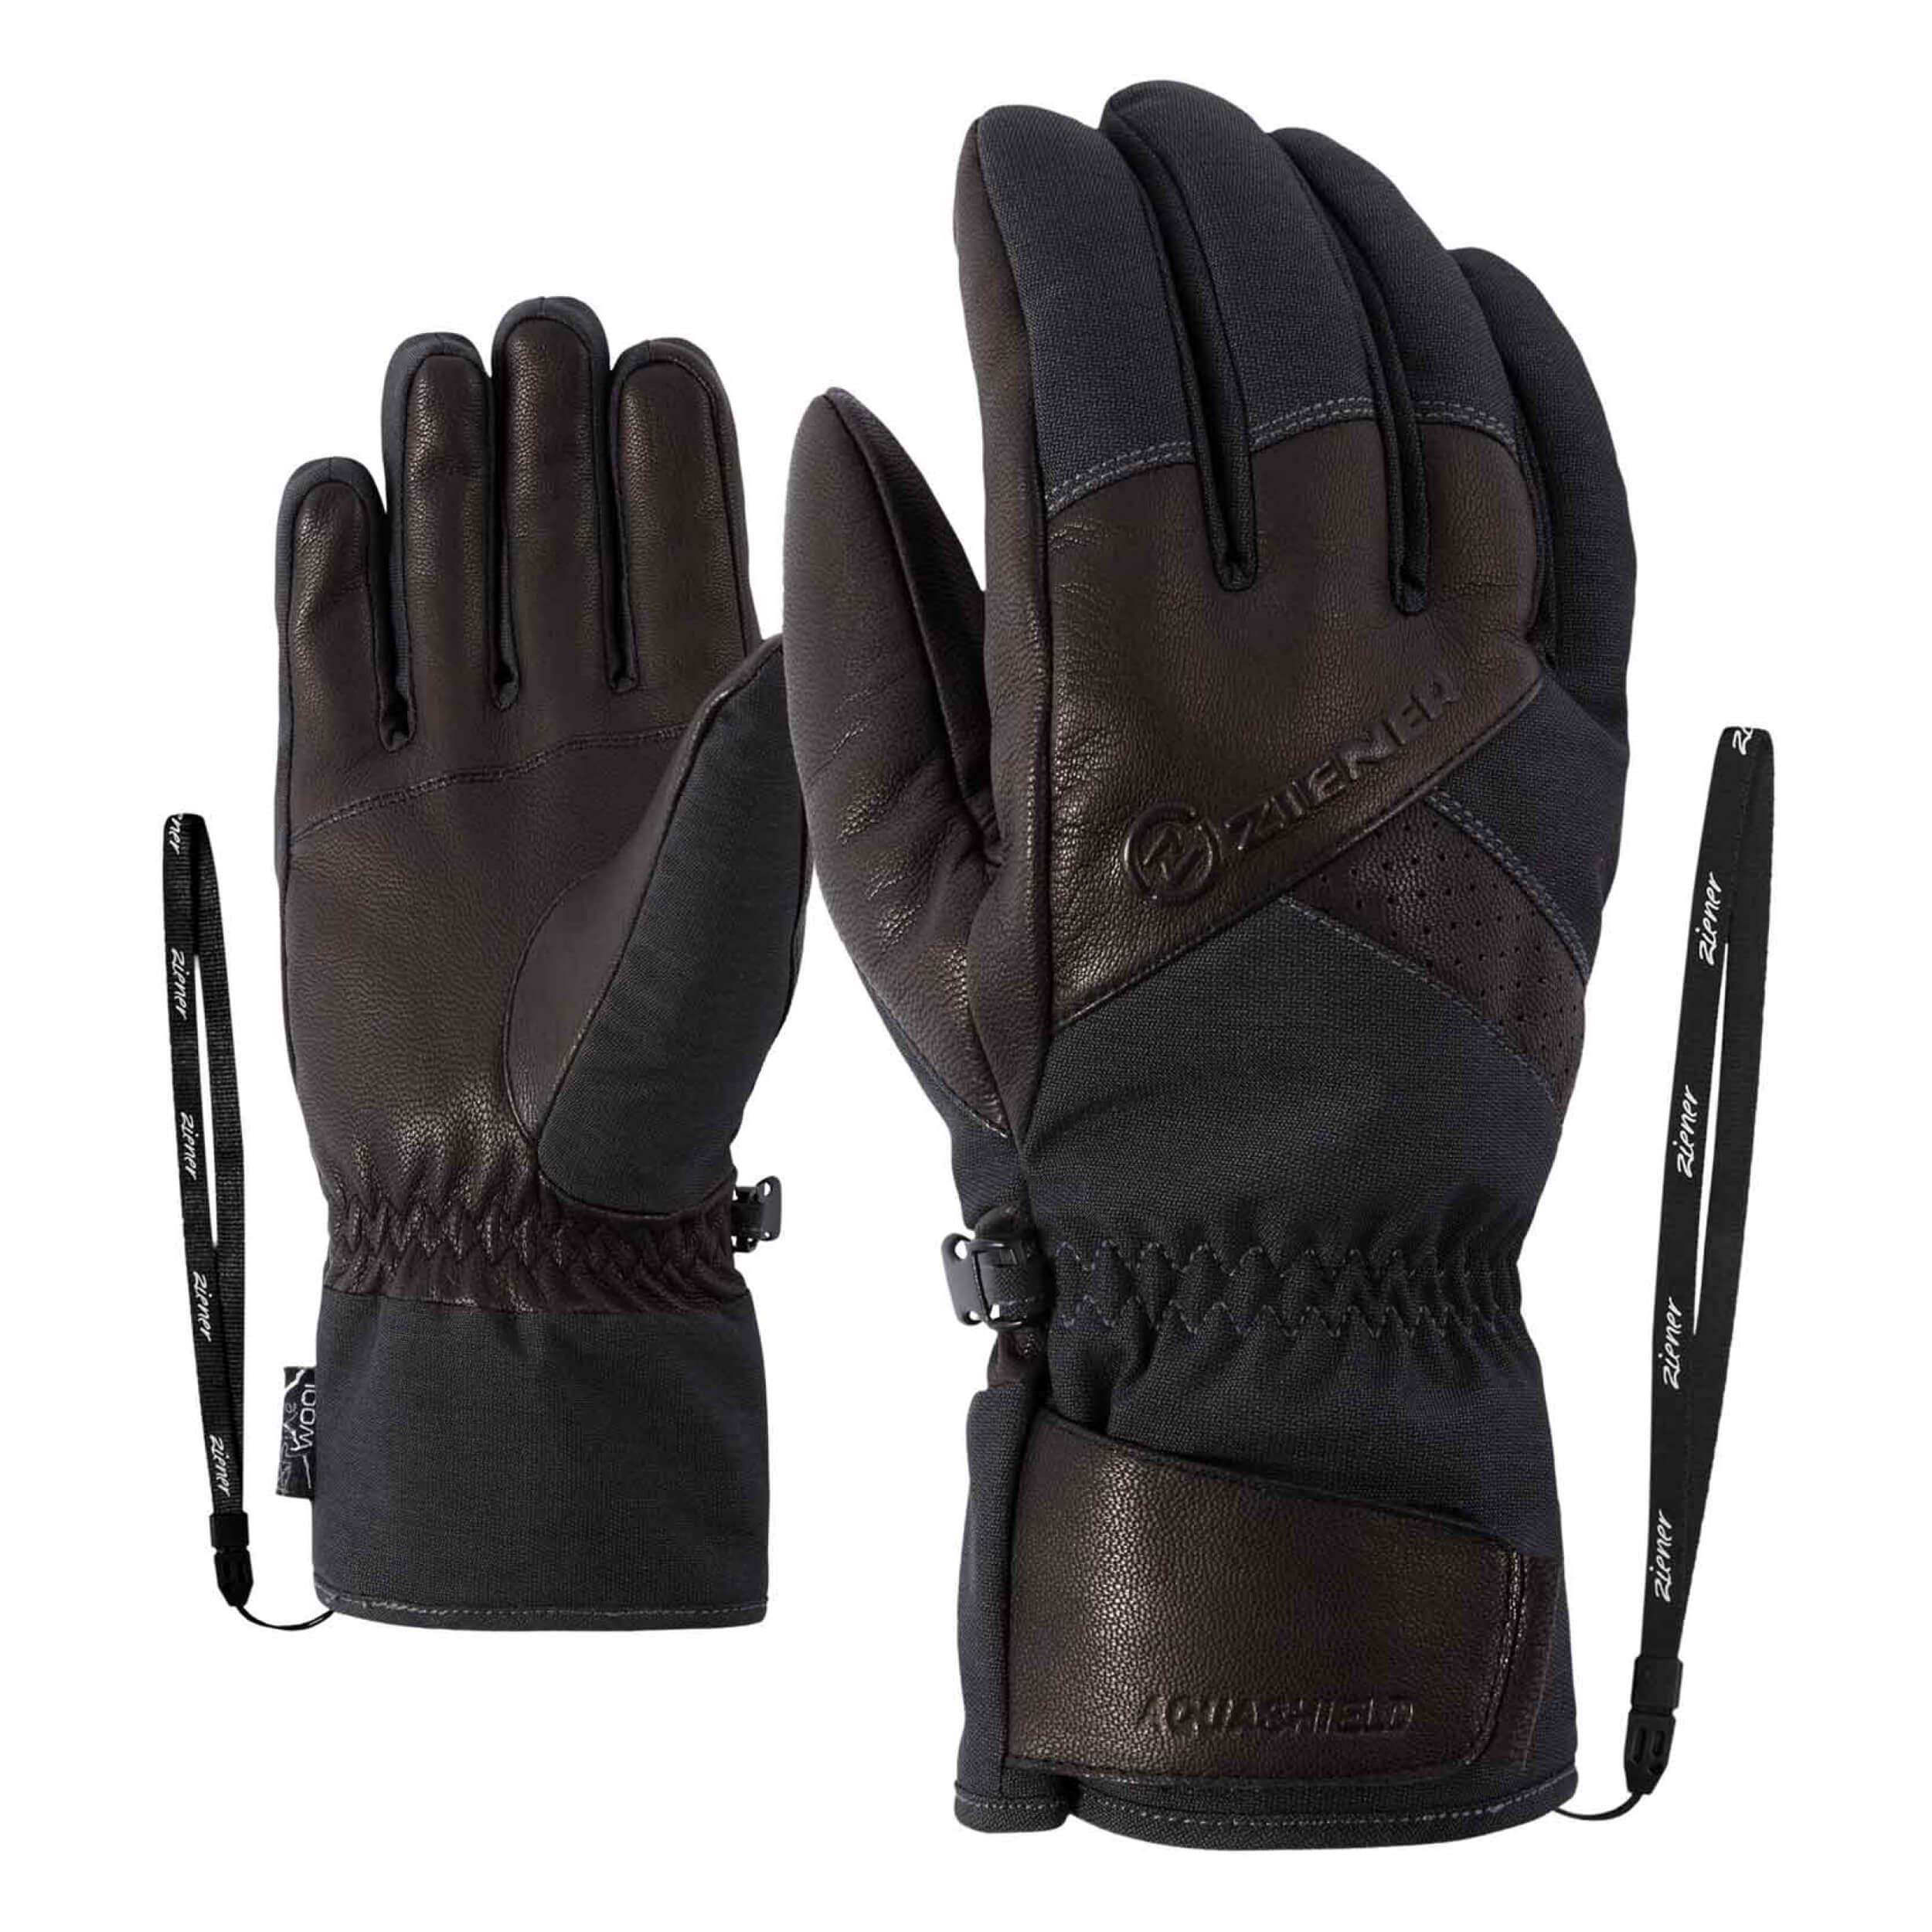 ZIENER Ski Handschuhe Getter Thermo Shield grau 869